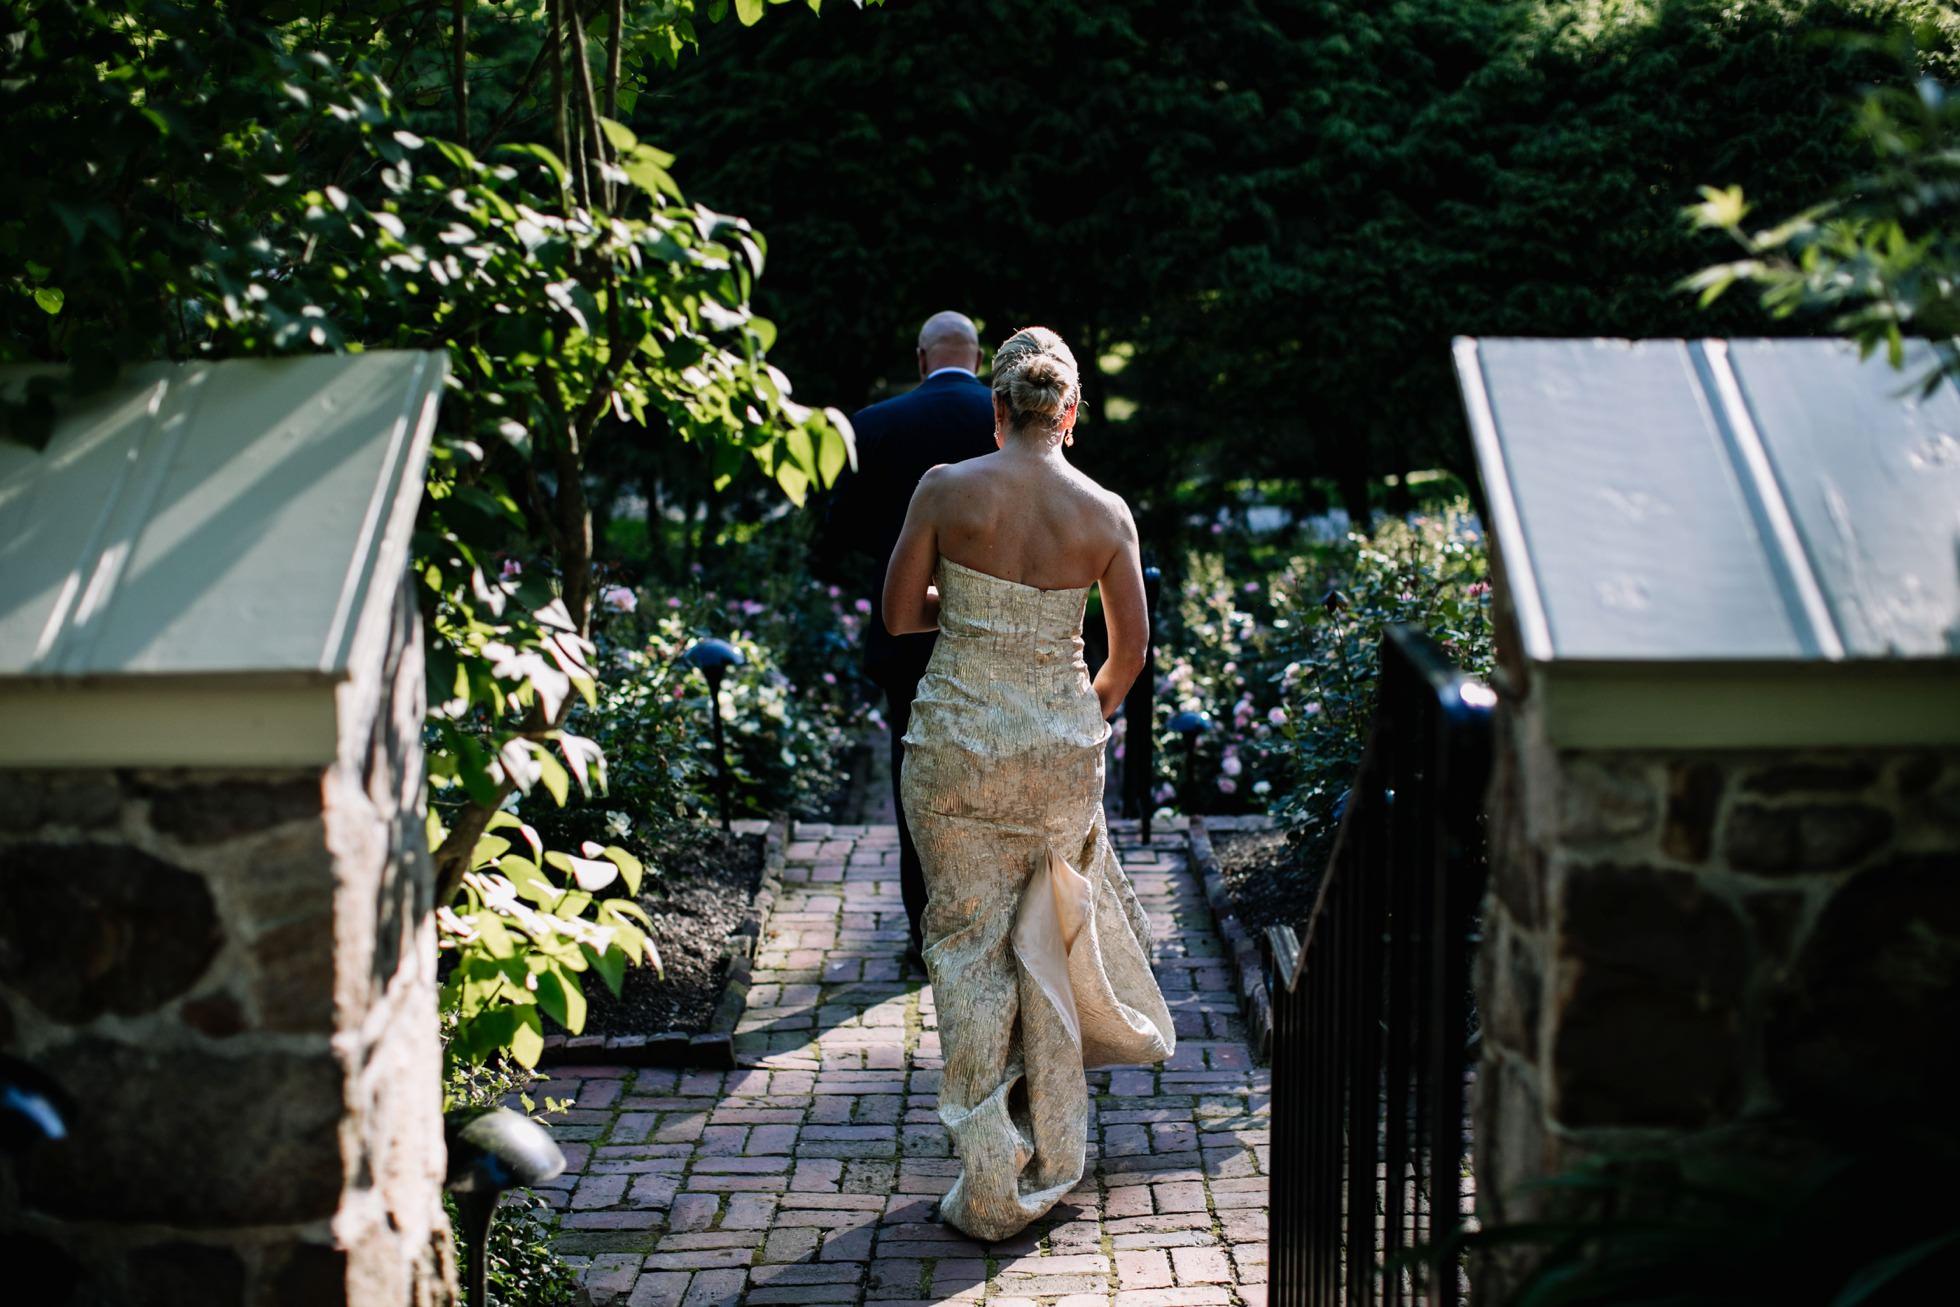 Best Unique PA NY NJ Wedding Venues - Appleford Estate